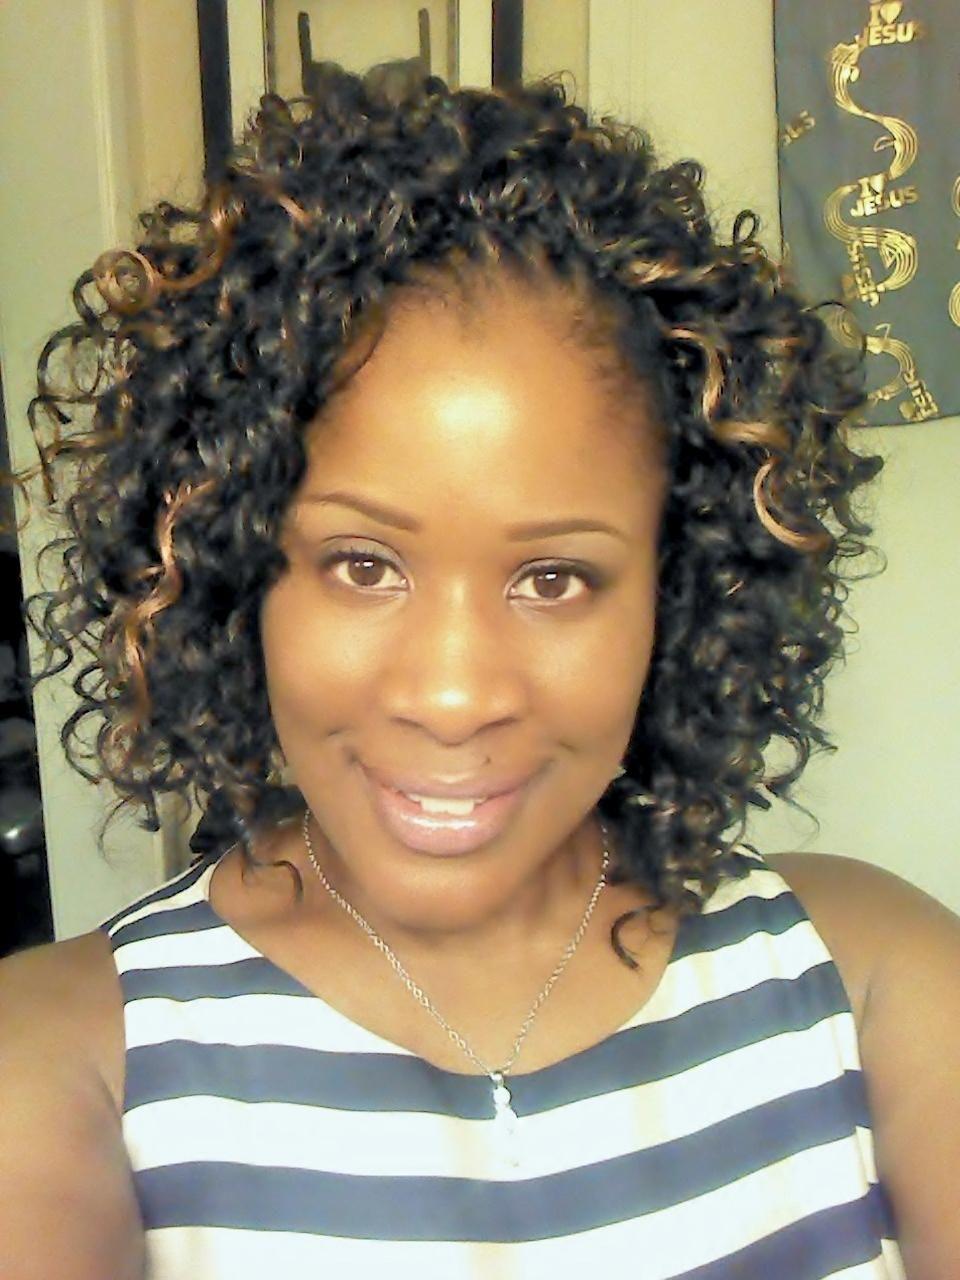 Freetress Gogo Curl Styled By Ms Pk S Crochet Braids Located In Mcdonough Ga Mspk Crochet Hair Styles Freetress Curly Crochet Hair Styles Crochet Hair Styles